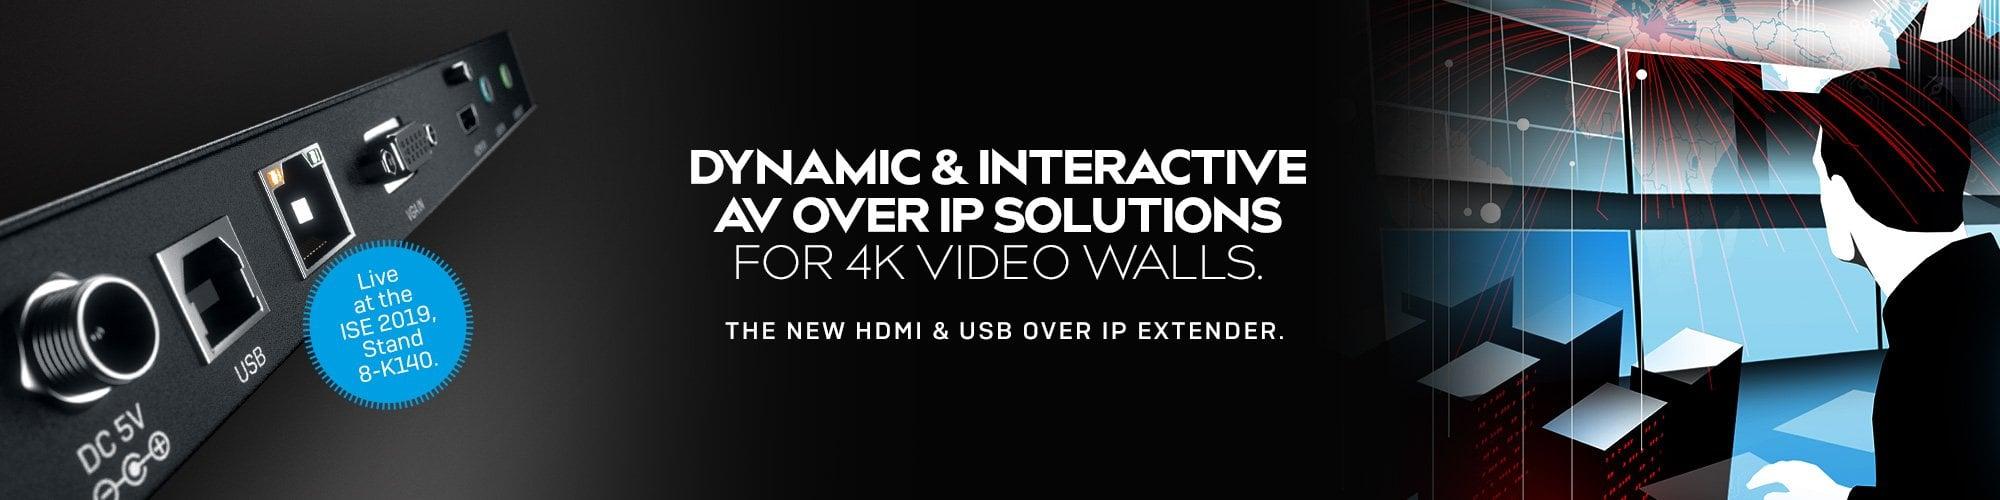 4K HDMI & USB OVER IP EXTENDER